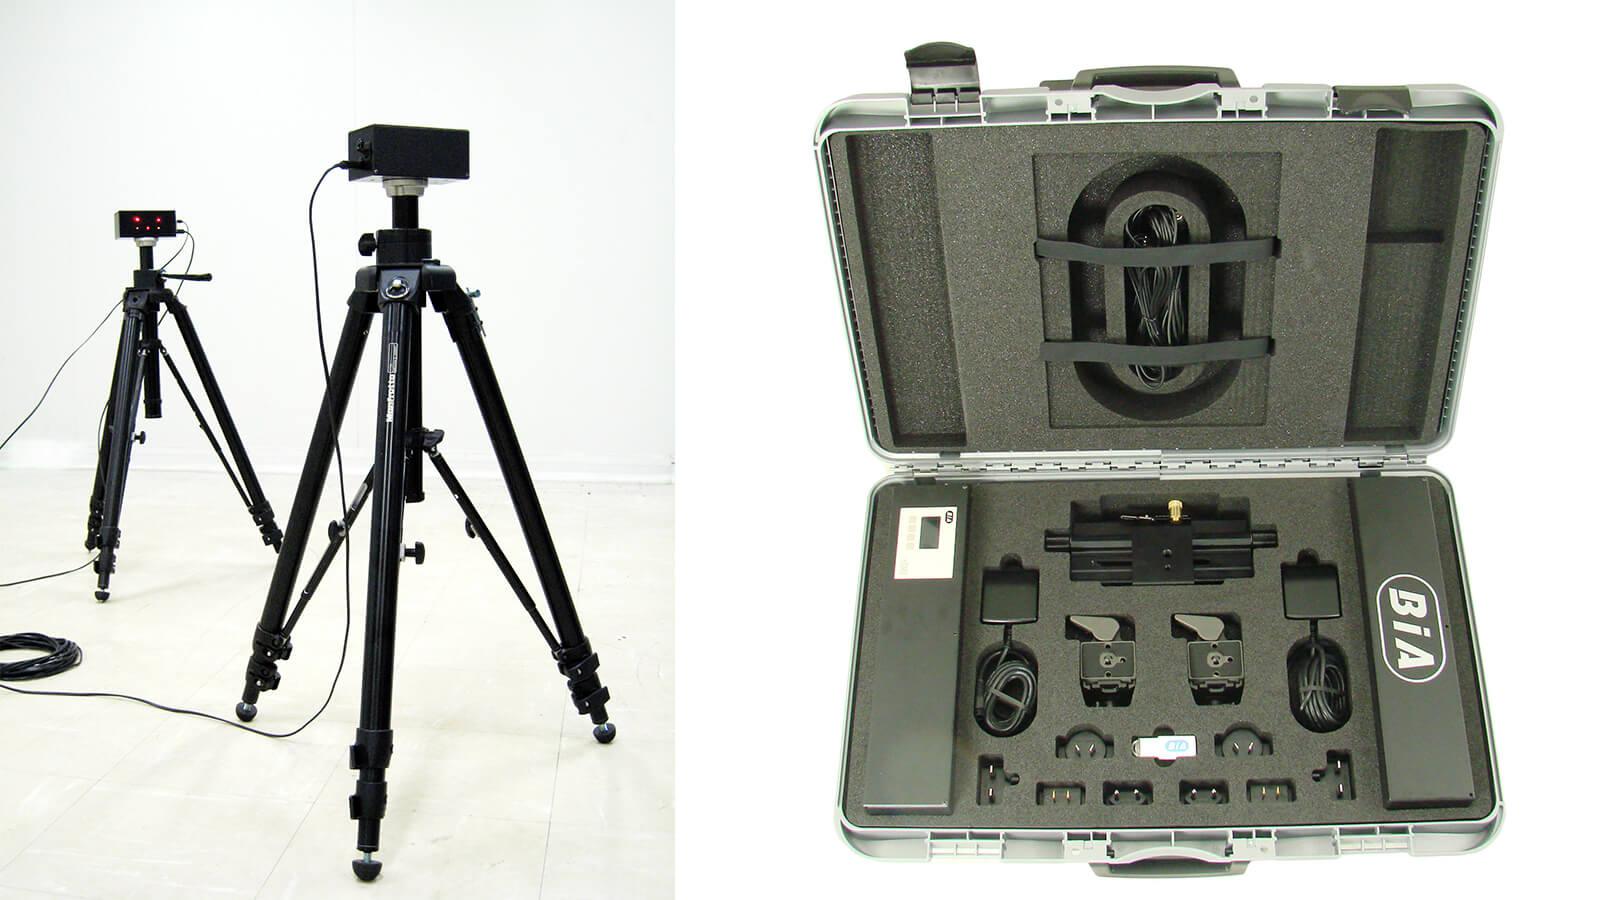 Laser Speed Measurement Device